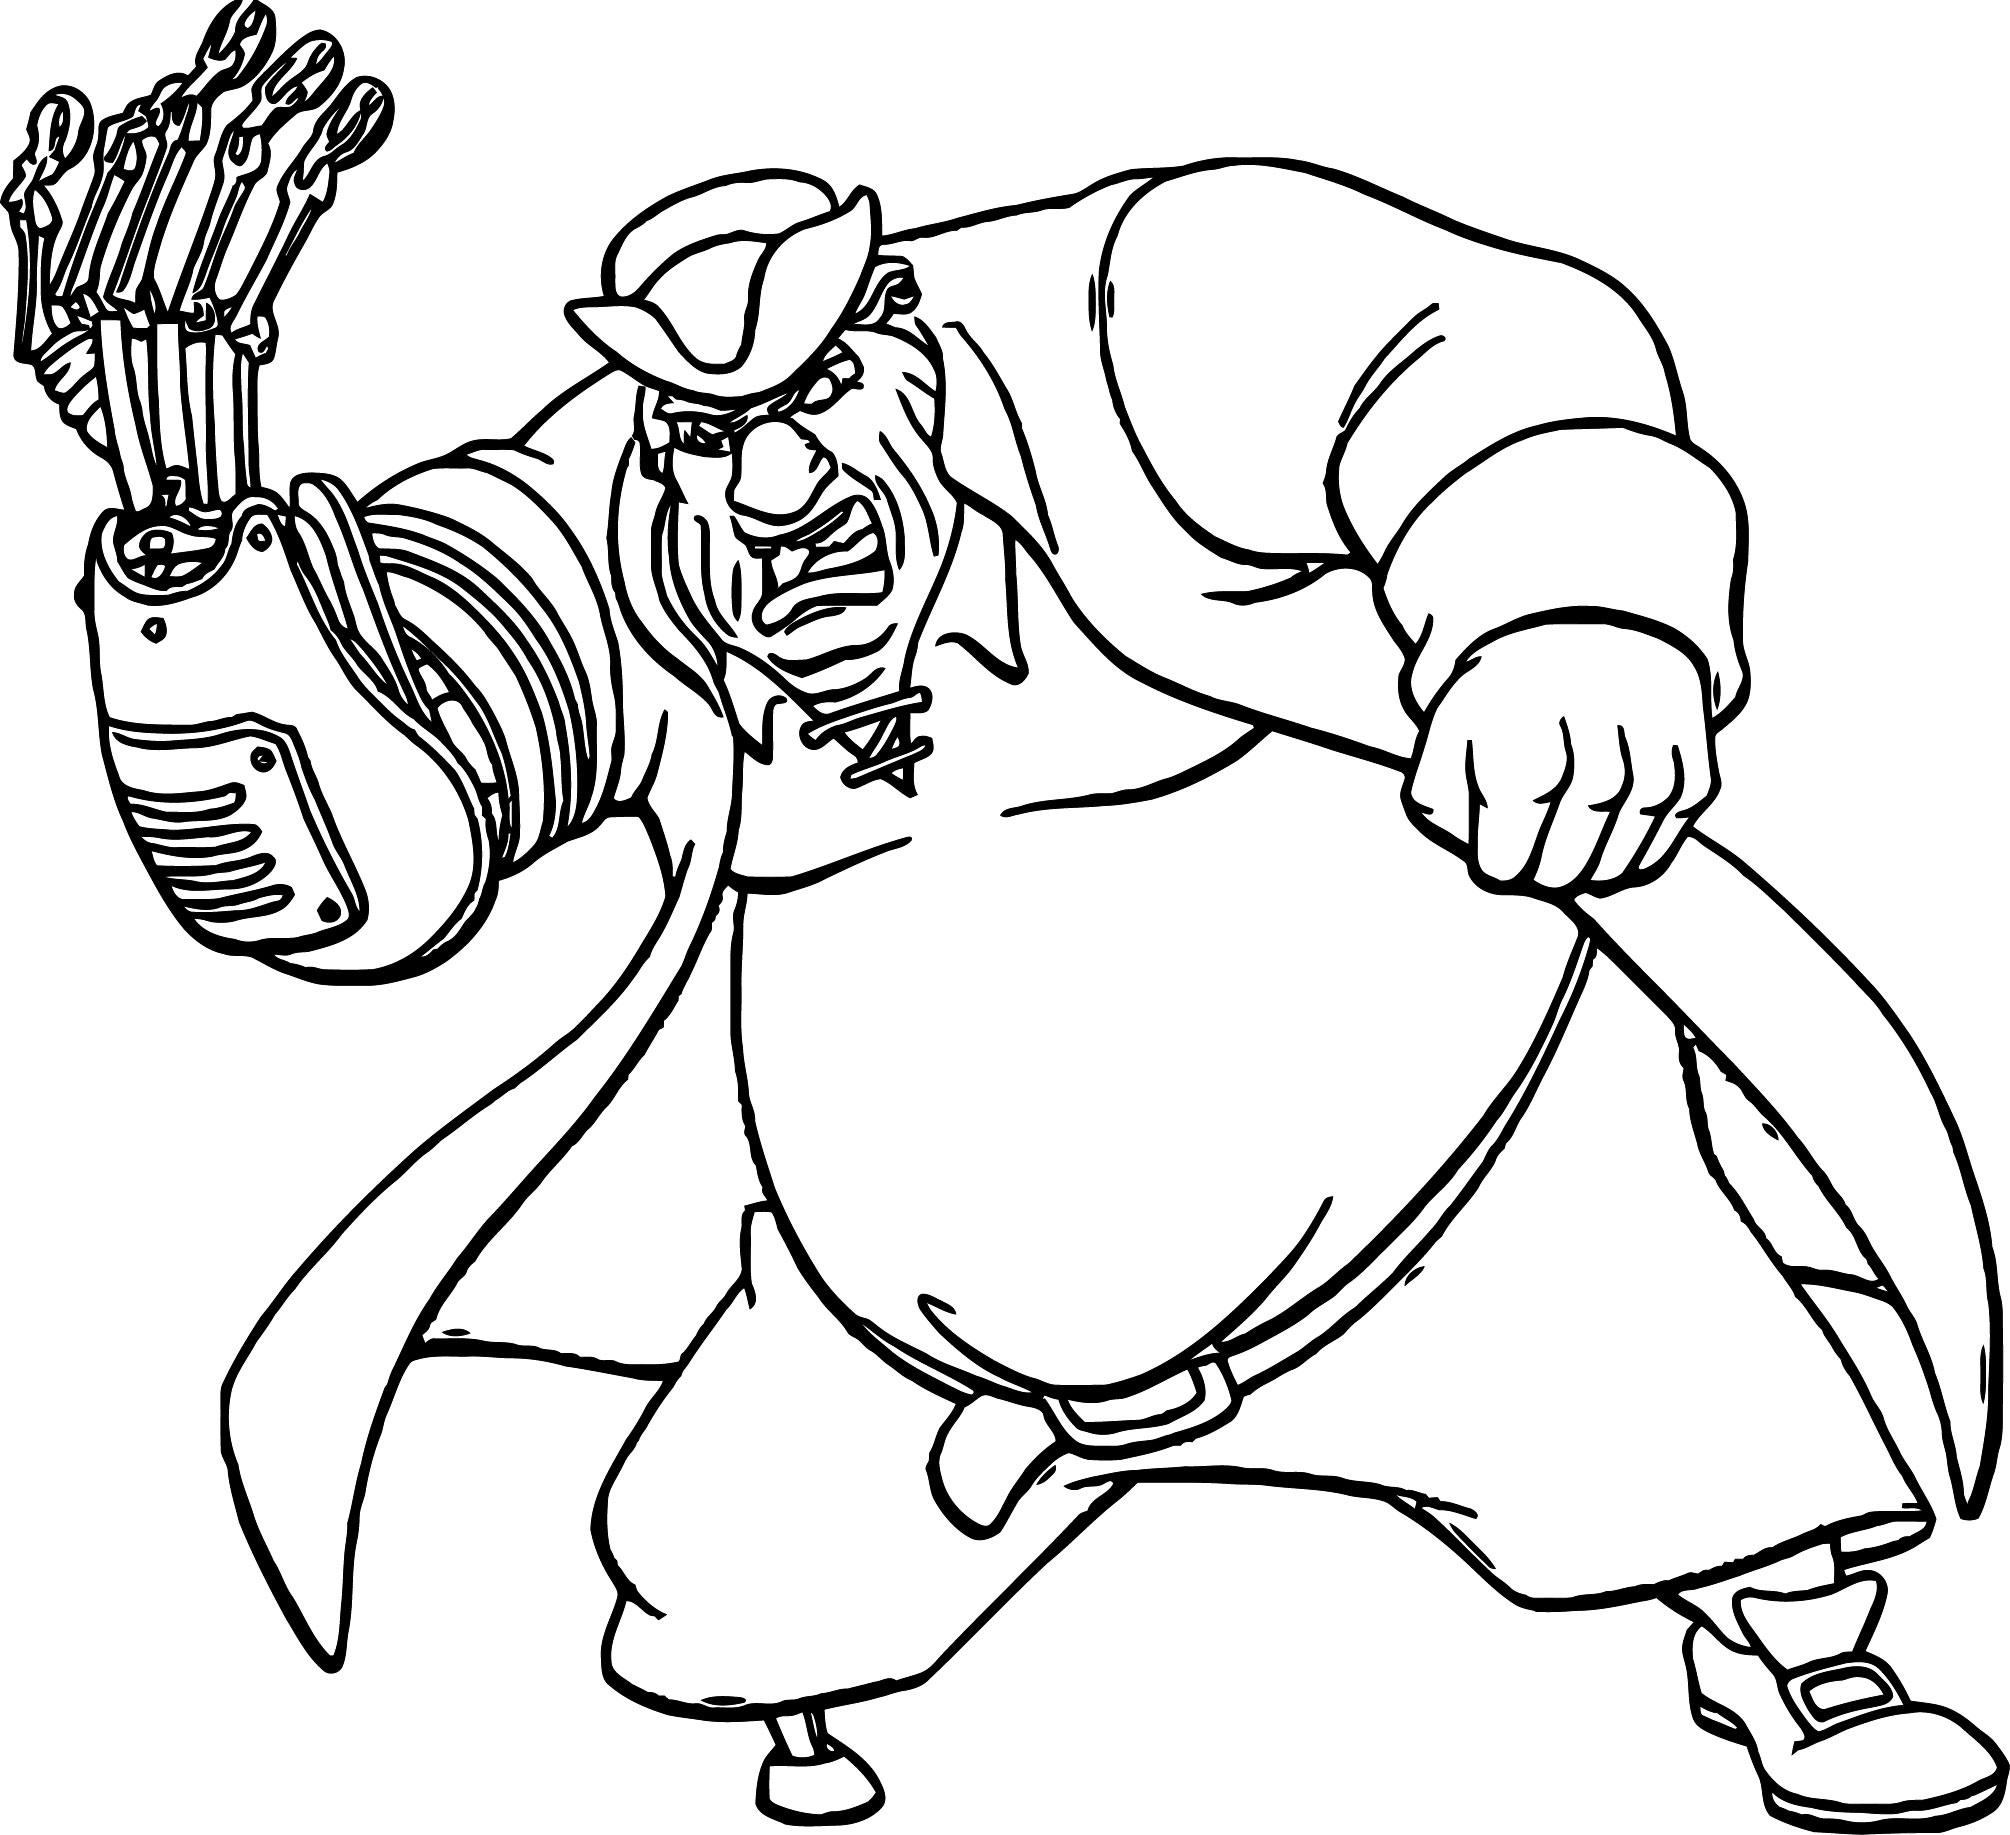 Treasure Planet pfg 37 Coloring Pages Cartoon